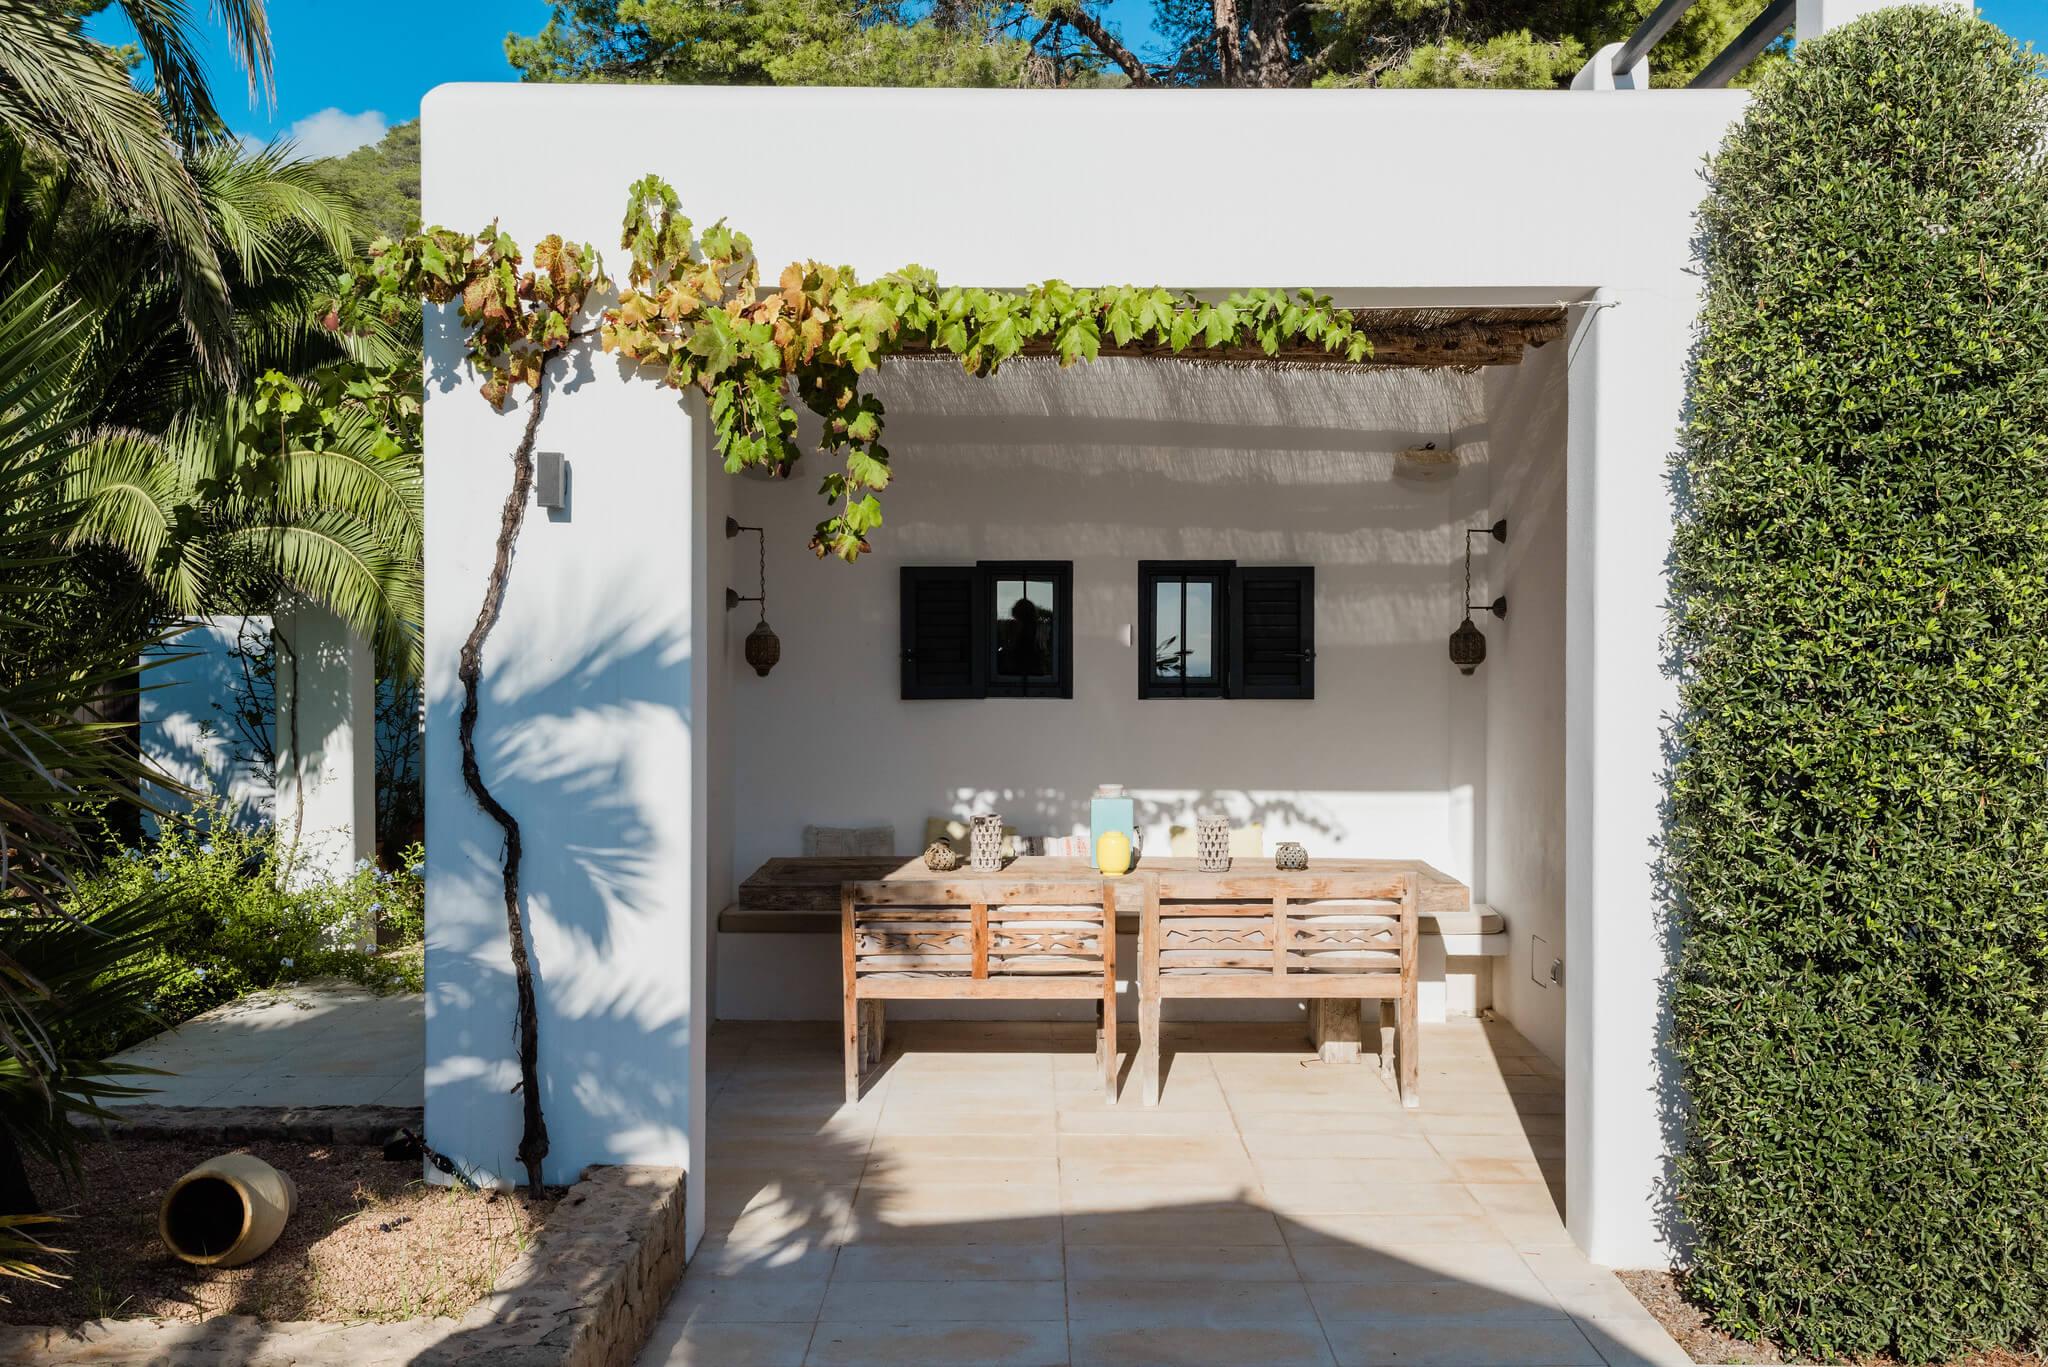 https://www.white-ibiza.com/wp-content/uploads/2020/05/white-ibiza-villas-casa-amalia-exterior-outside-dining.jpg